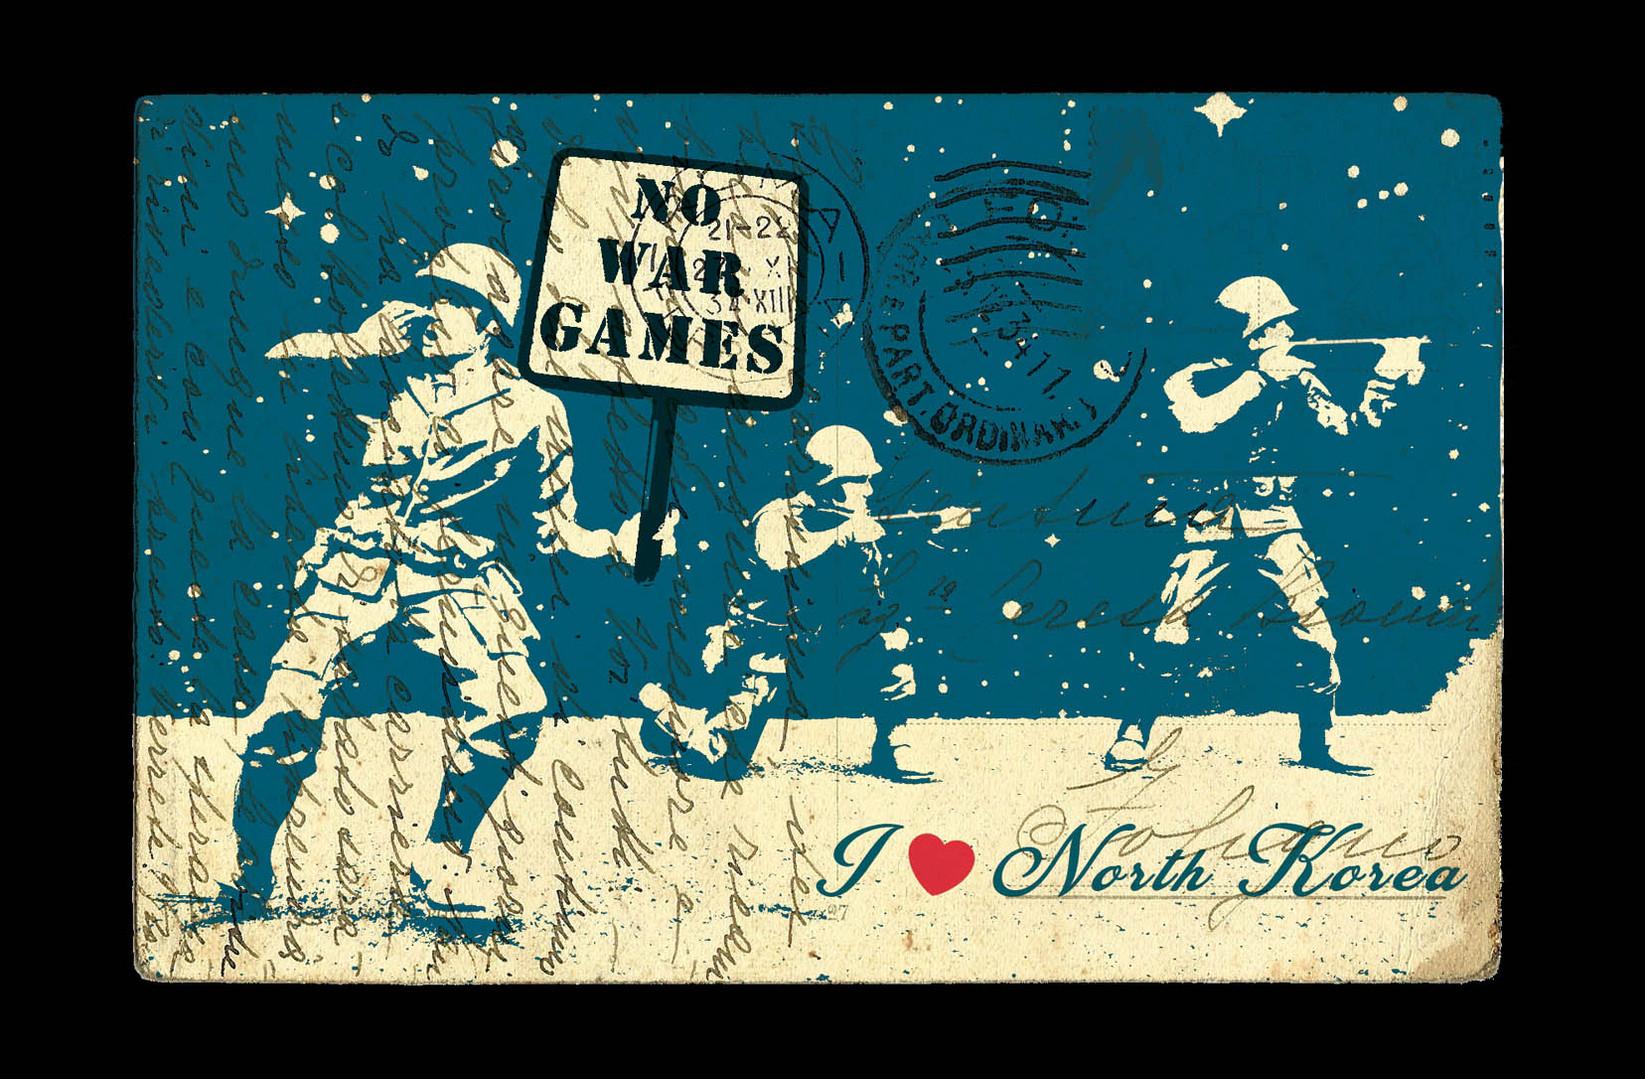 no war games small